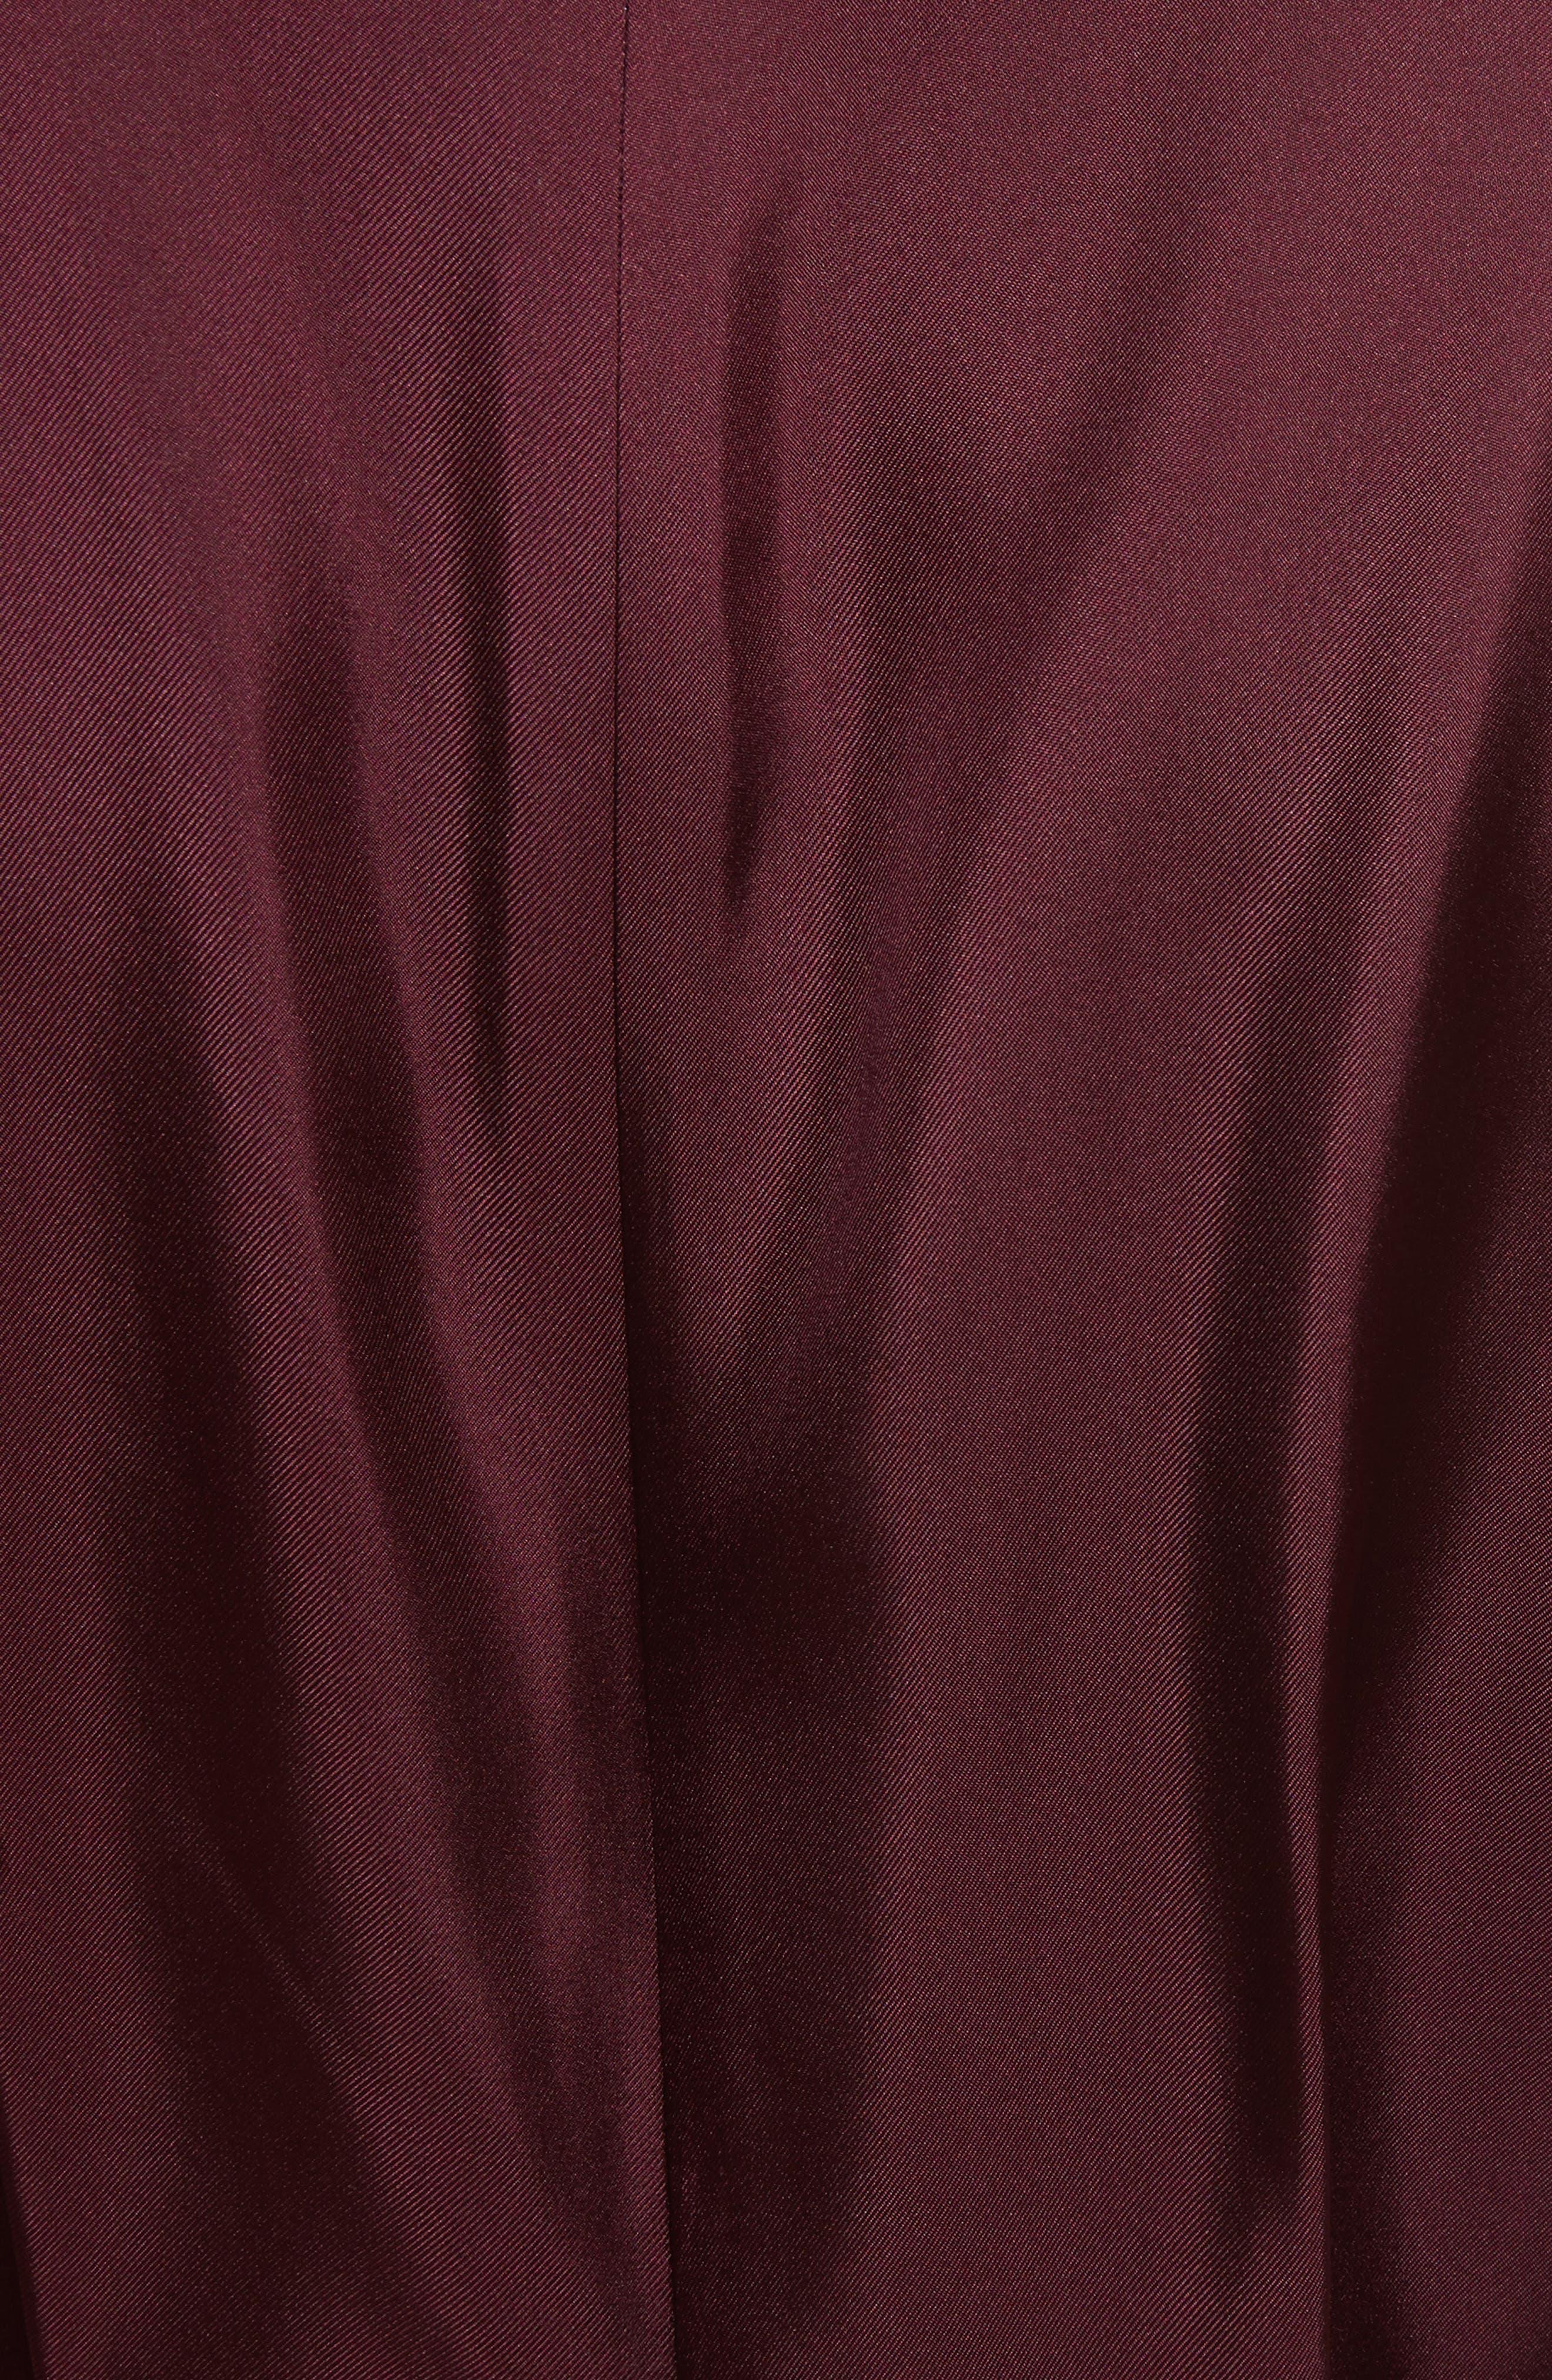 Jensah Tie Neck Mixed Media Dress,                             Alternate thumbnail 5, color,                             Dark Blue